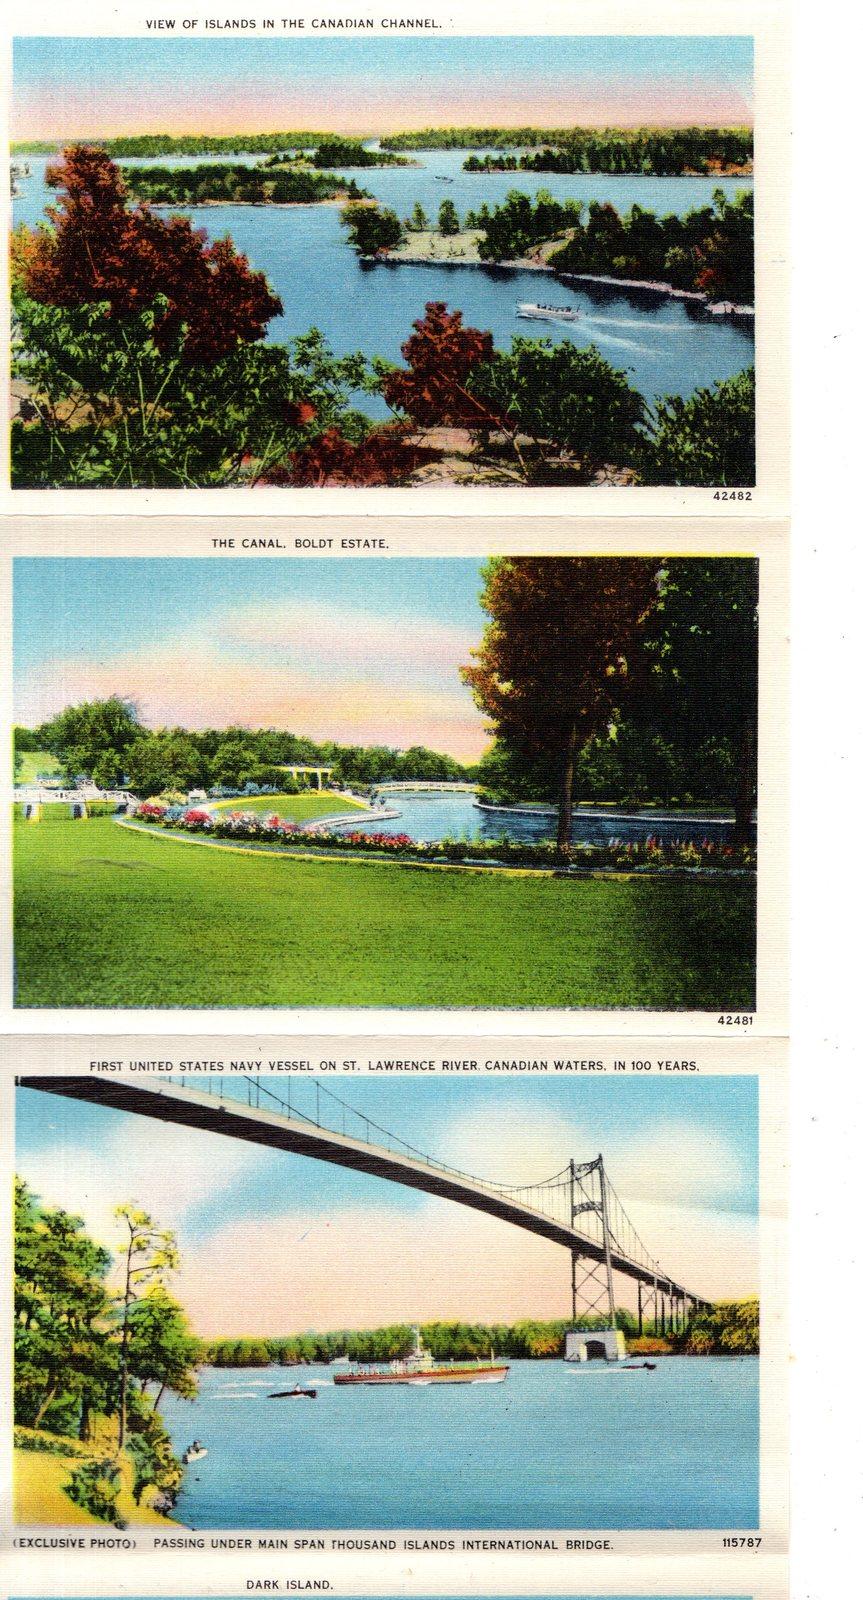 Thousand Islands Venice Of America Book & Souvenir Photo Booklet image 12